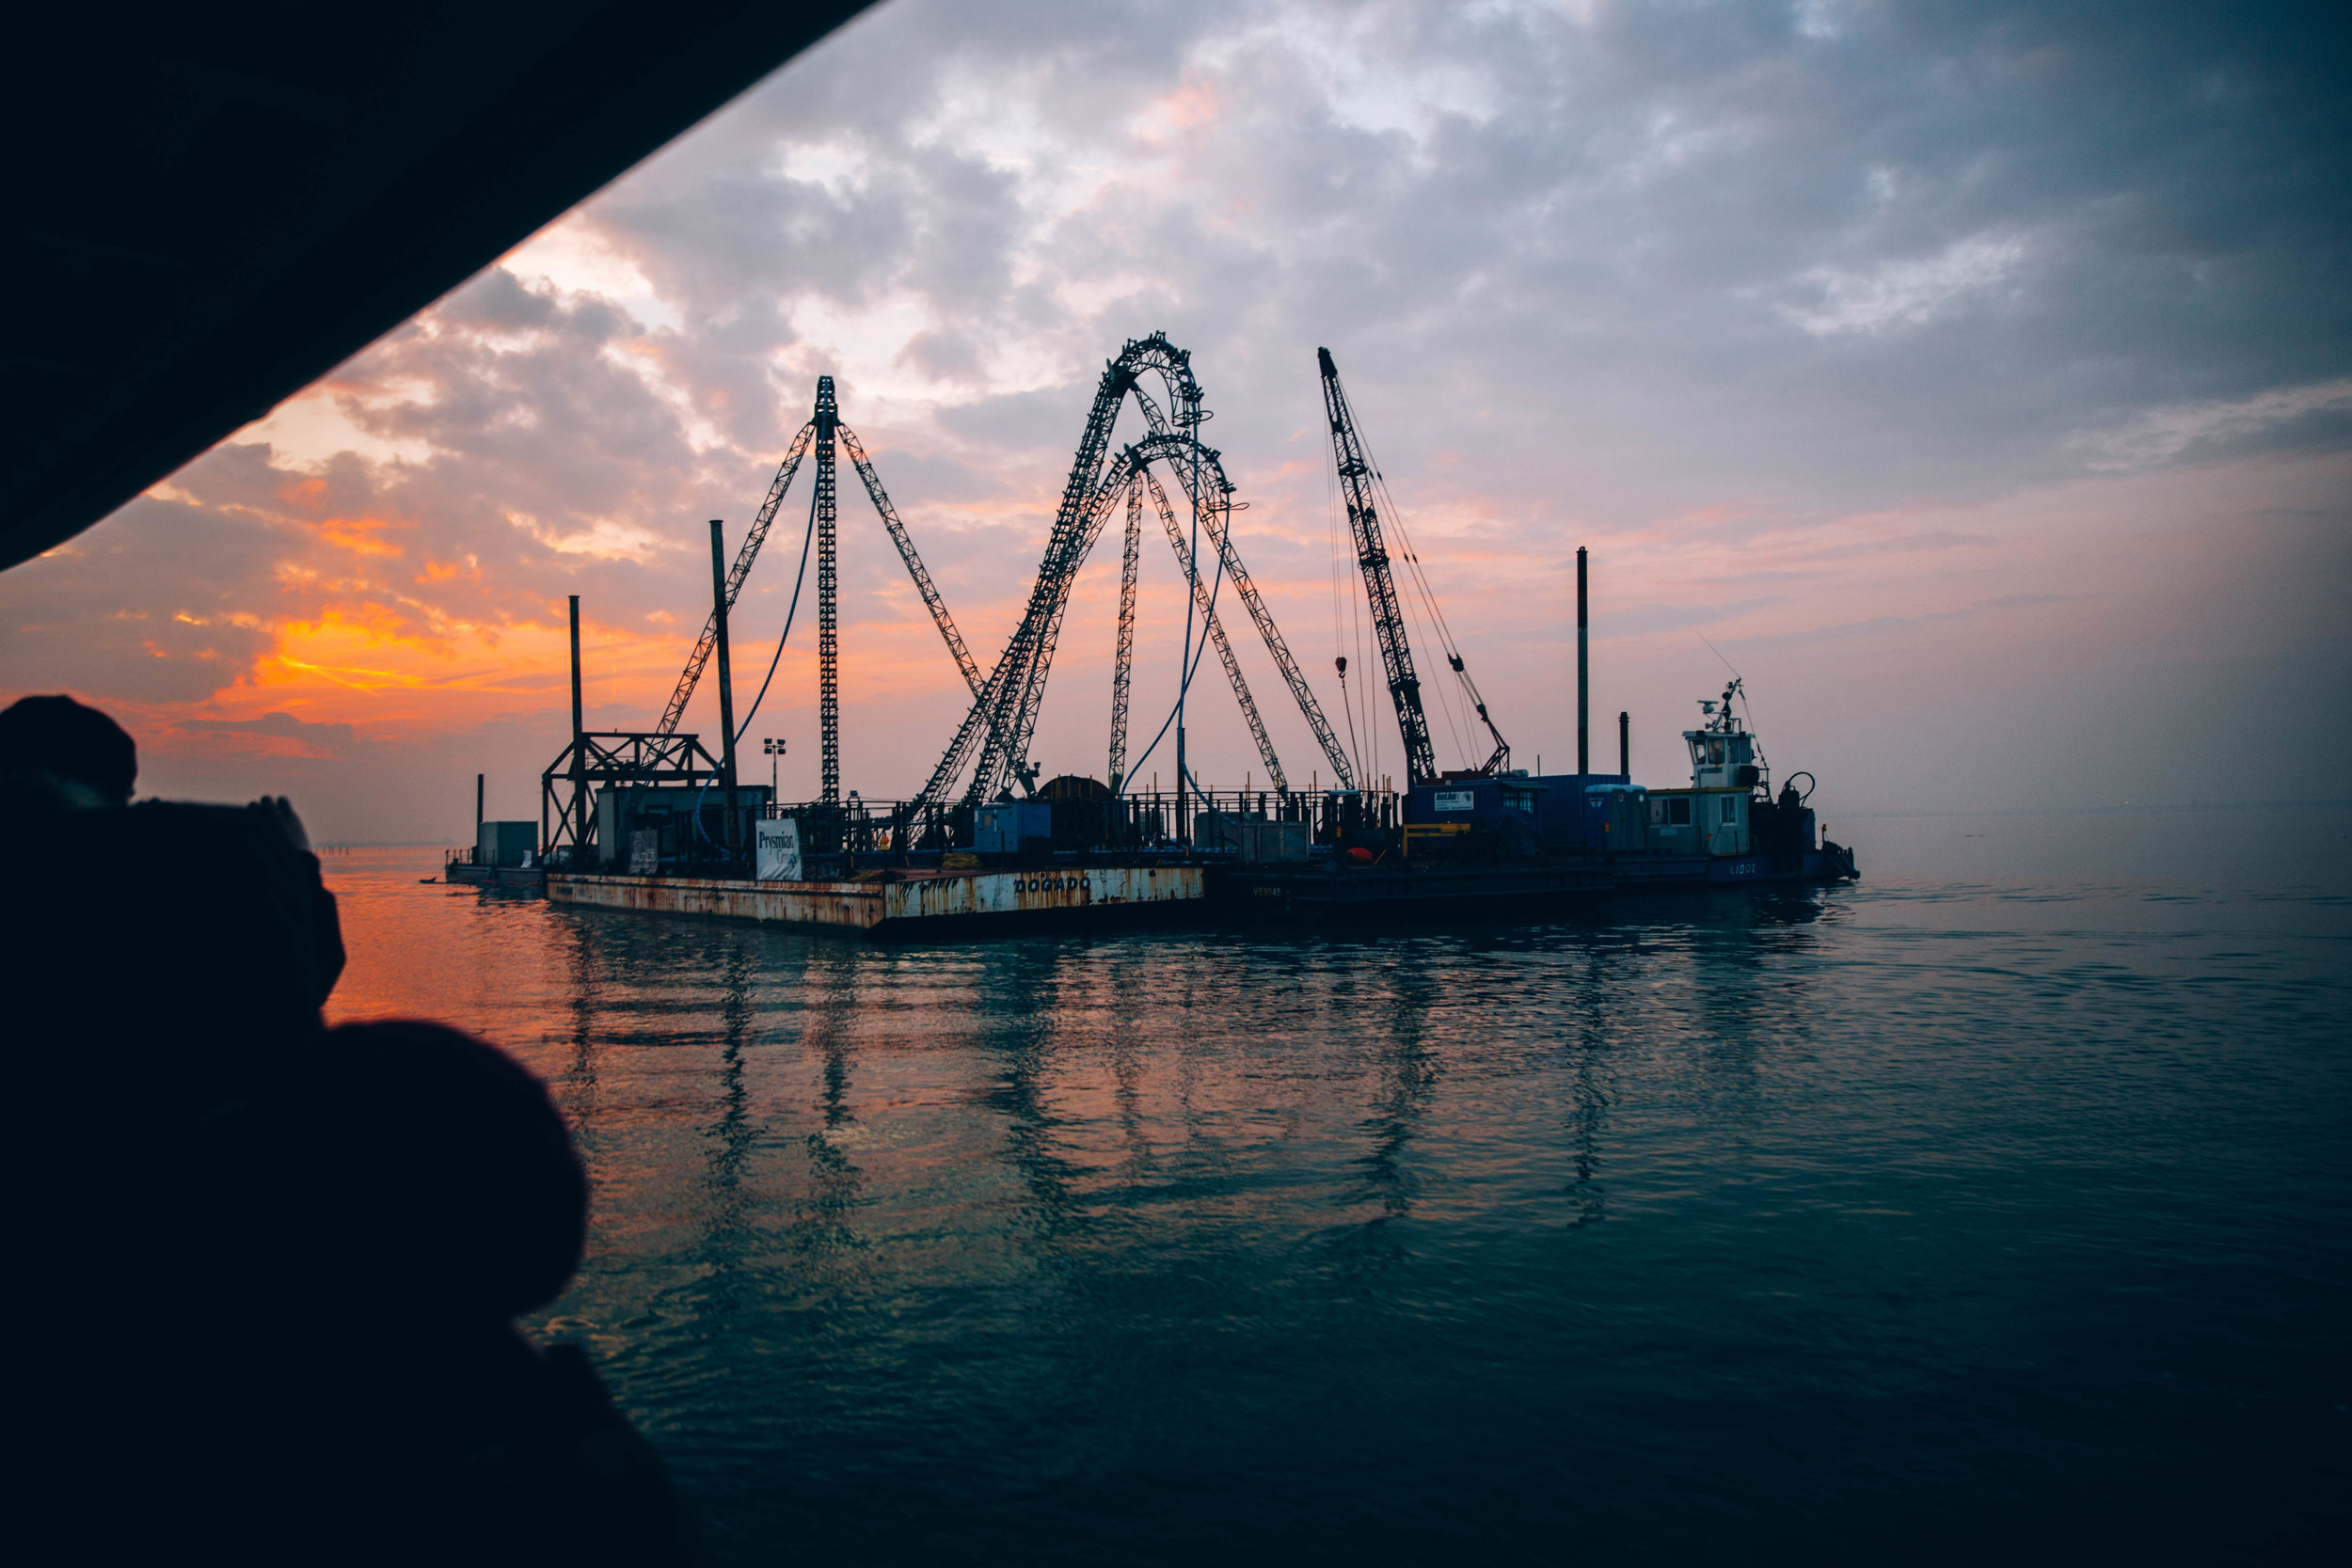 Venice-287.jpg